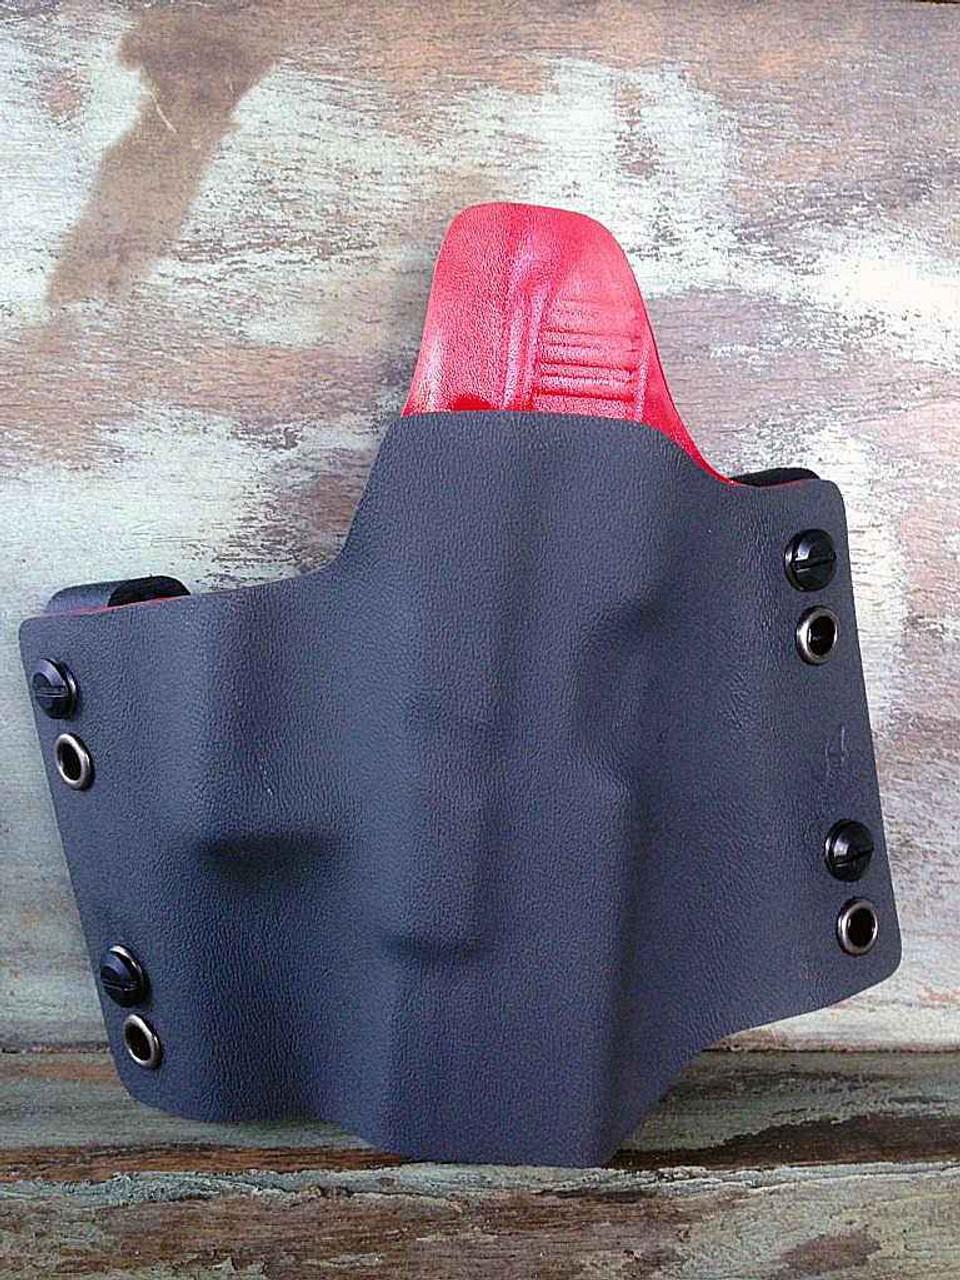 Concealment Muzzle Commander, Right Hand Glock 17, 22, 31, 19, 23, 32-Black